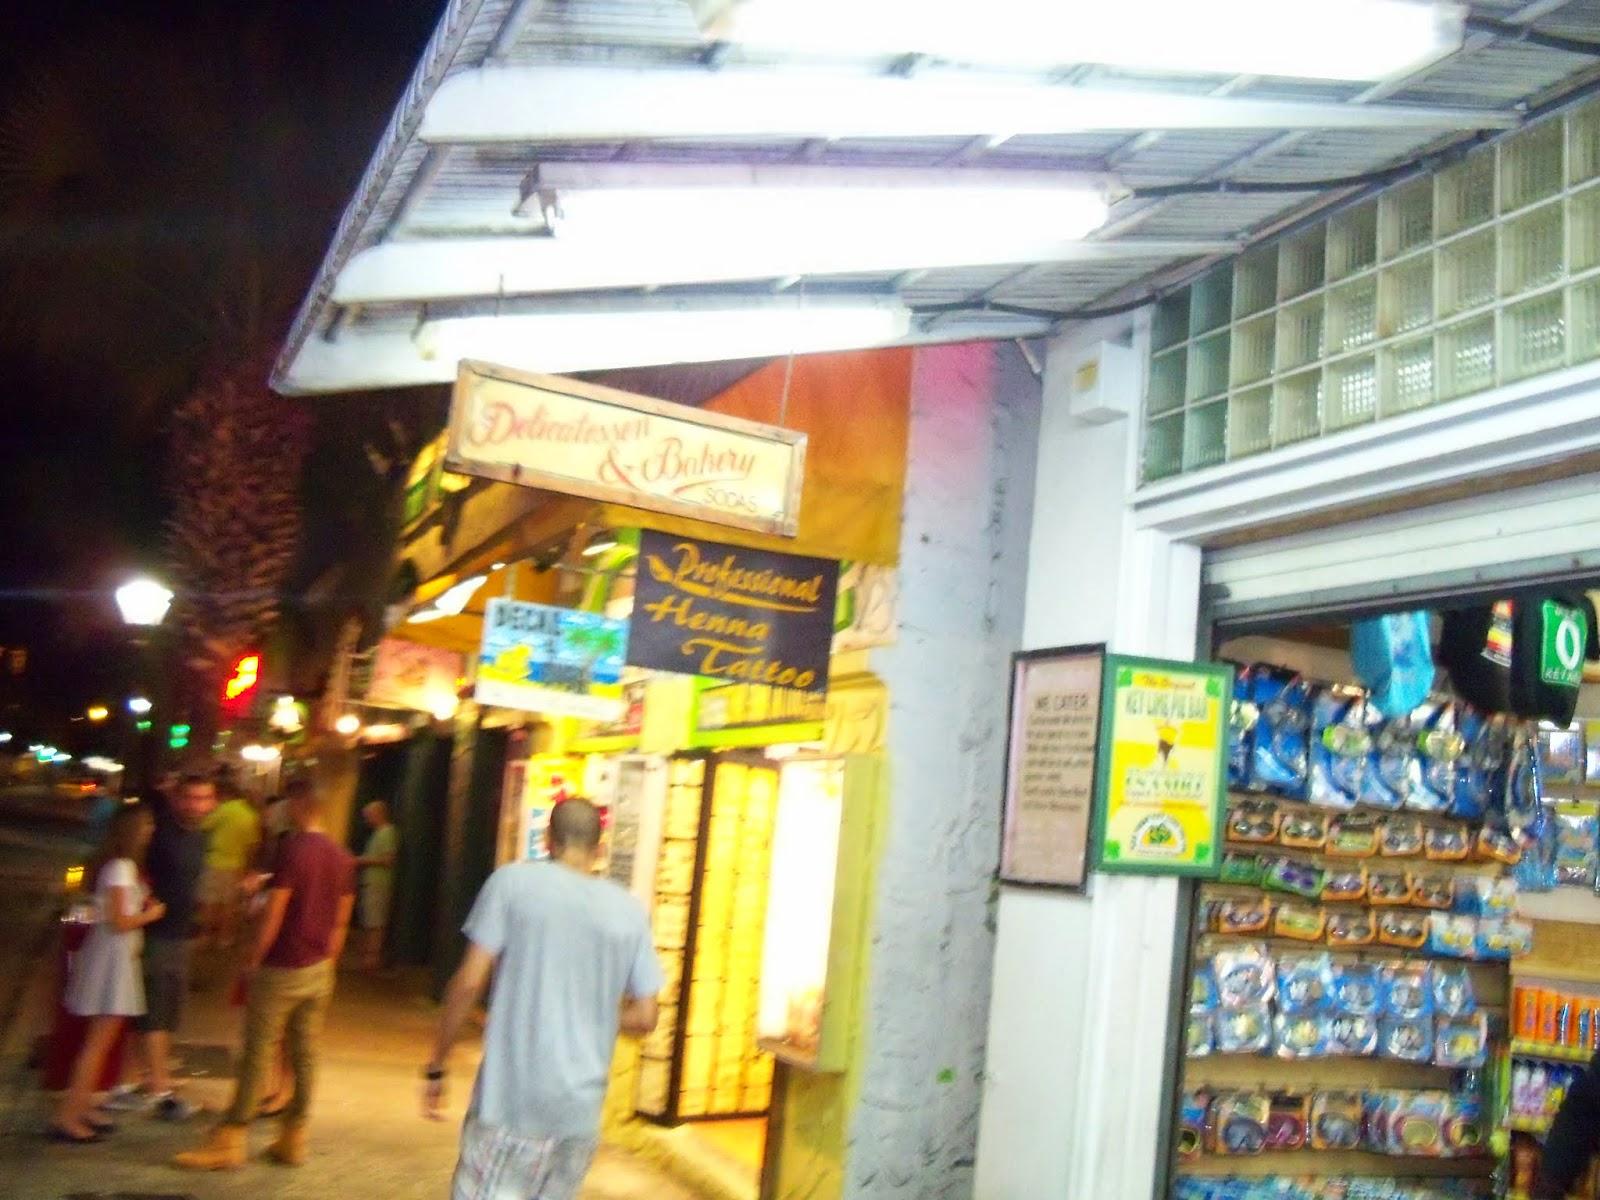 Key West Vacation - 116_5631.JPG